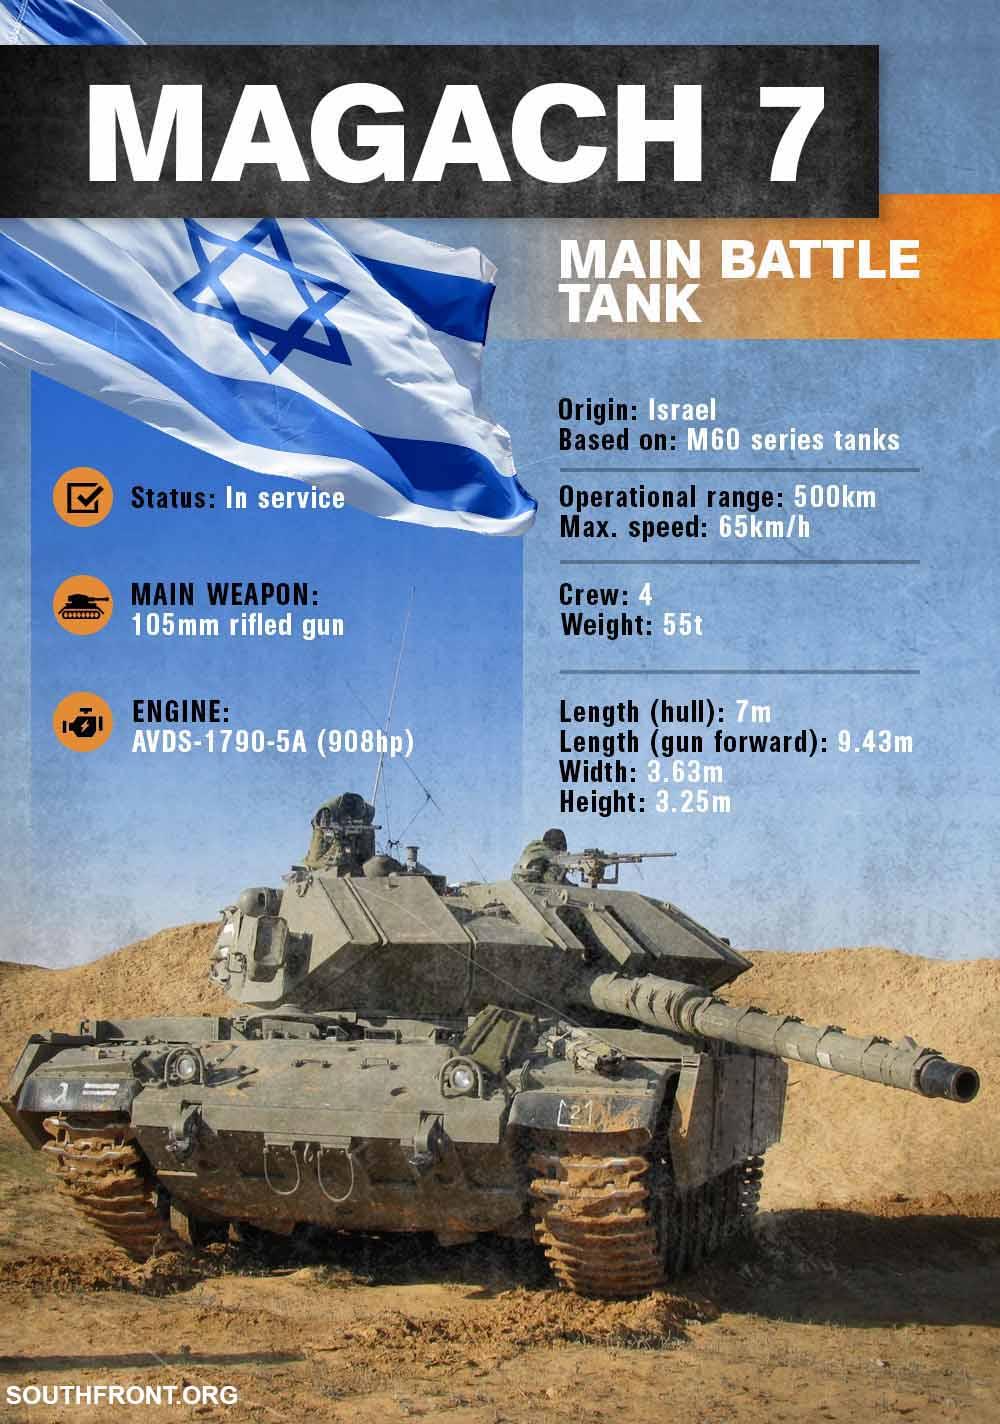 Magach 7 Main Battle Tank (Infographics)